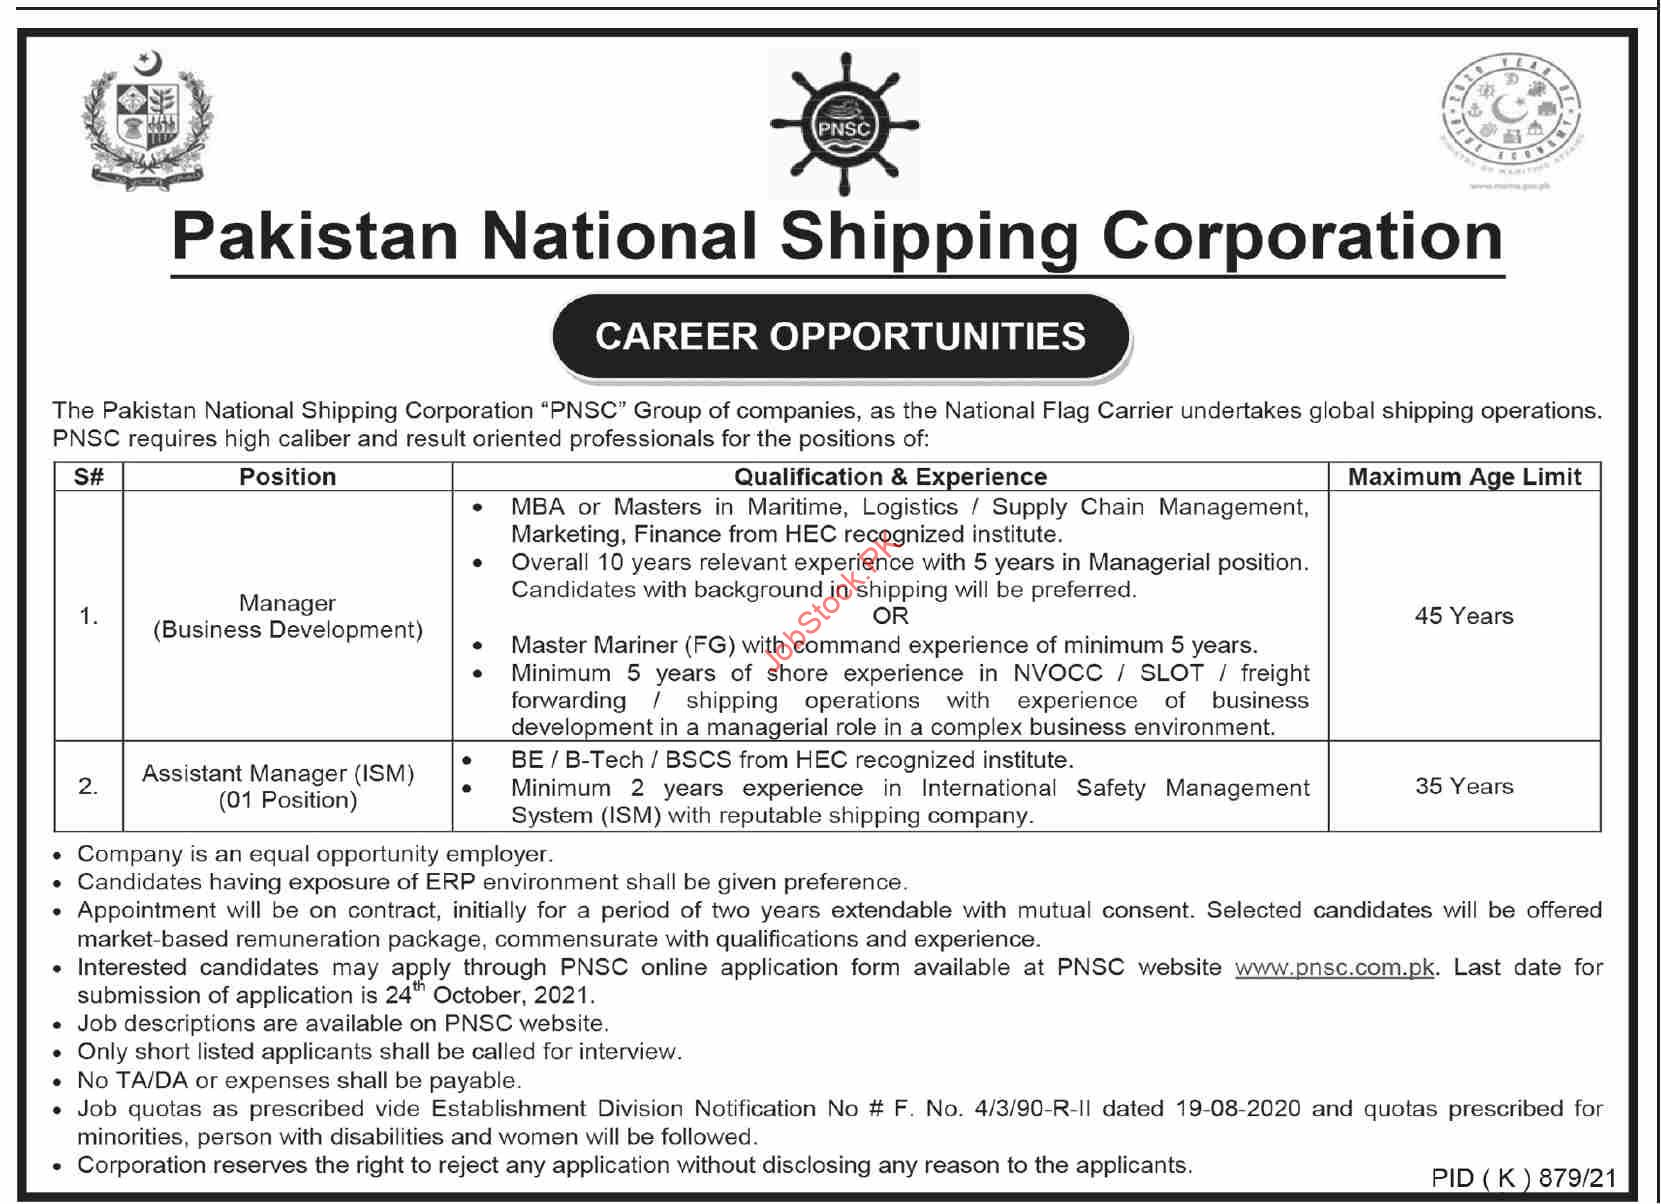 Paksitan National Shipping Corporation Jobs 2021